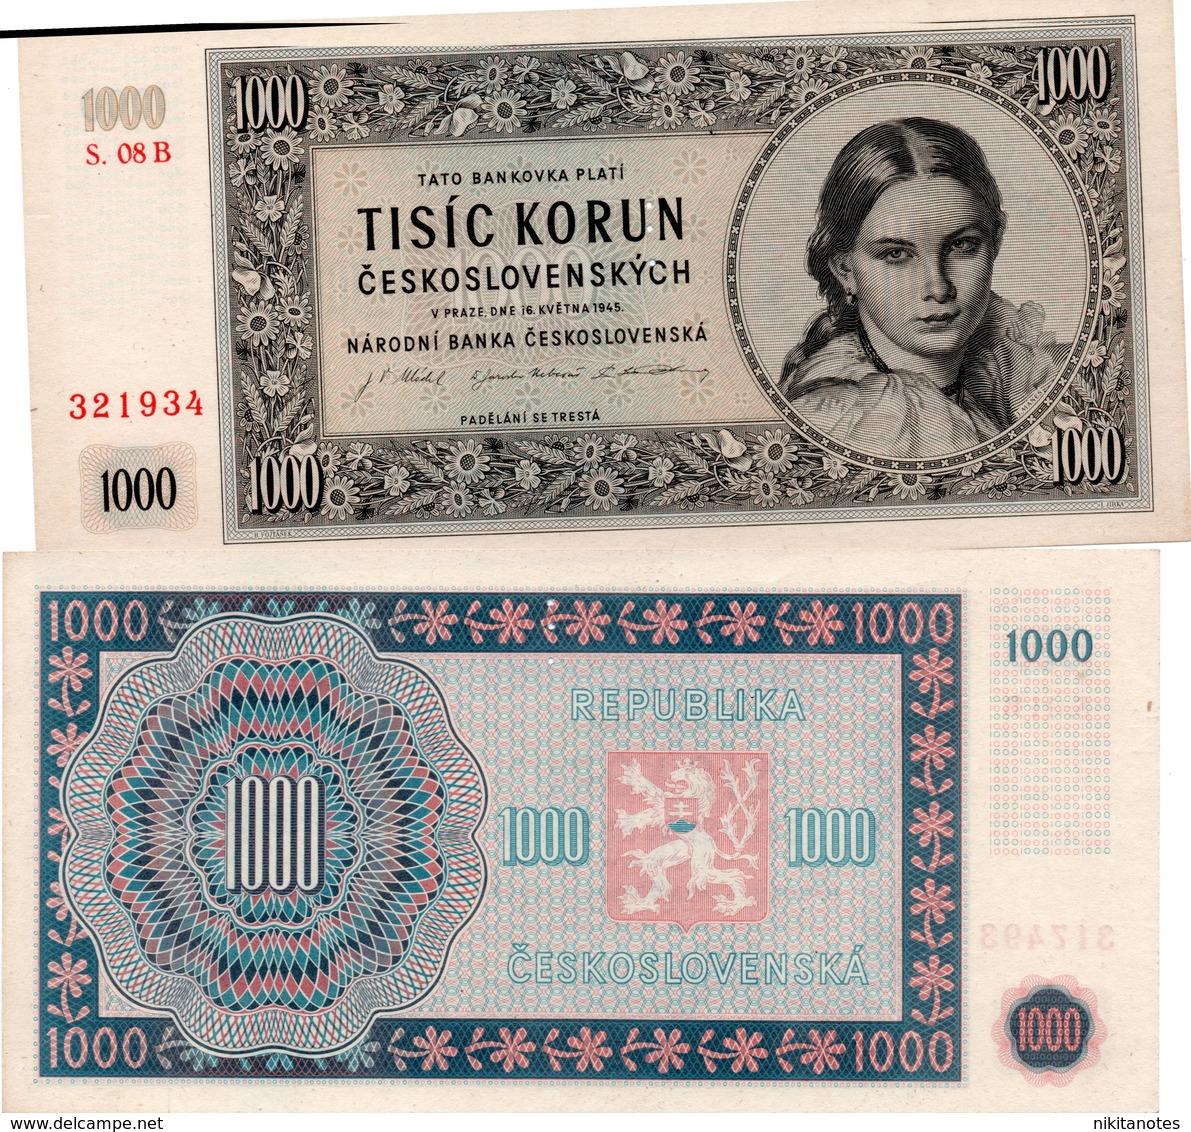 CZECHOSLOVAKIA 1000 1,000 KORUN 1945 P 74 SPECIMEN SEE SCAN 3 PUNTI - Tsjechoslowakije